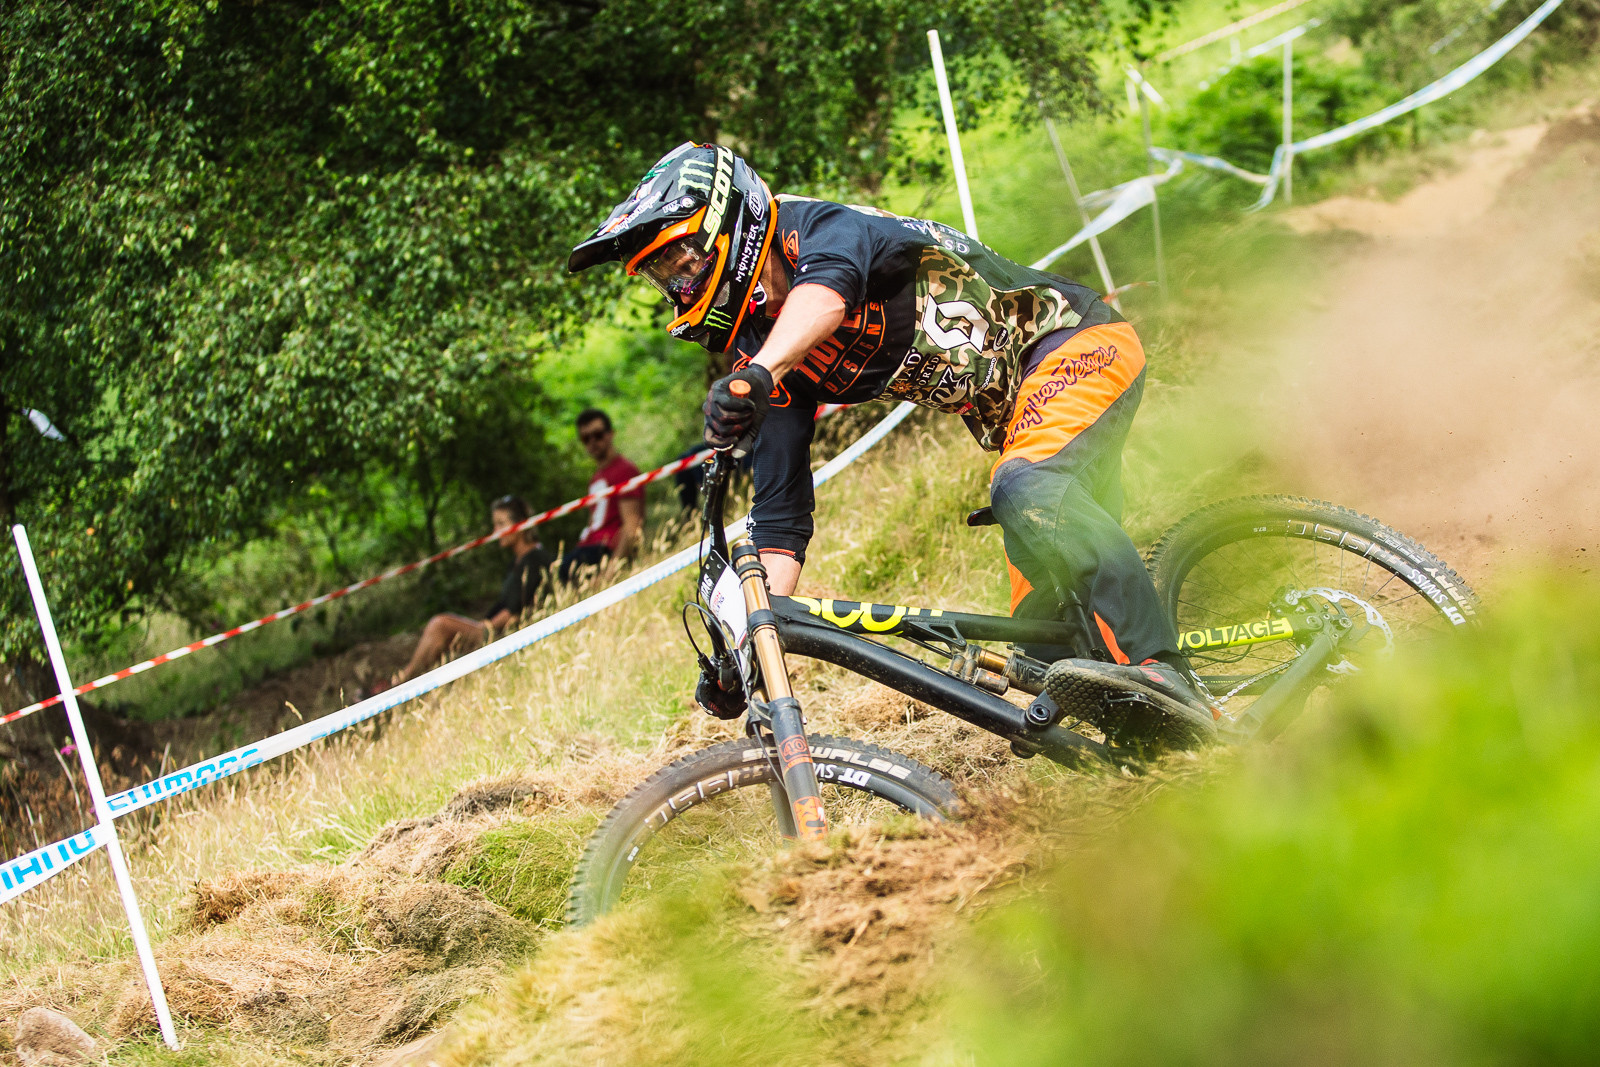 Brendan Fairclough - 2015 British National Champs Downhill - 2015 British National Champs Downhill Photos - Mountain Biking Pictures - Vital MTB